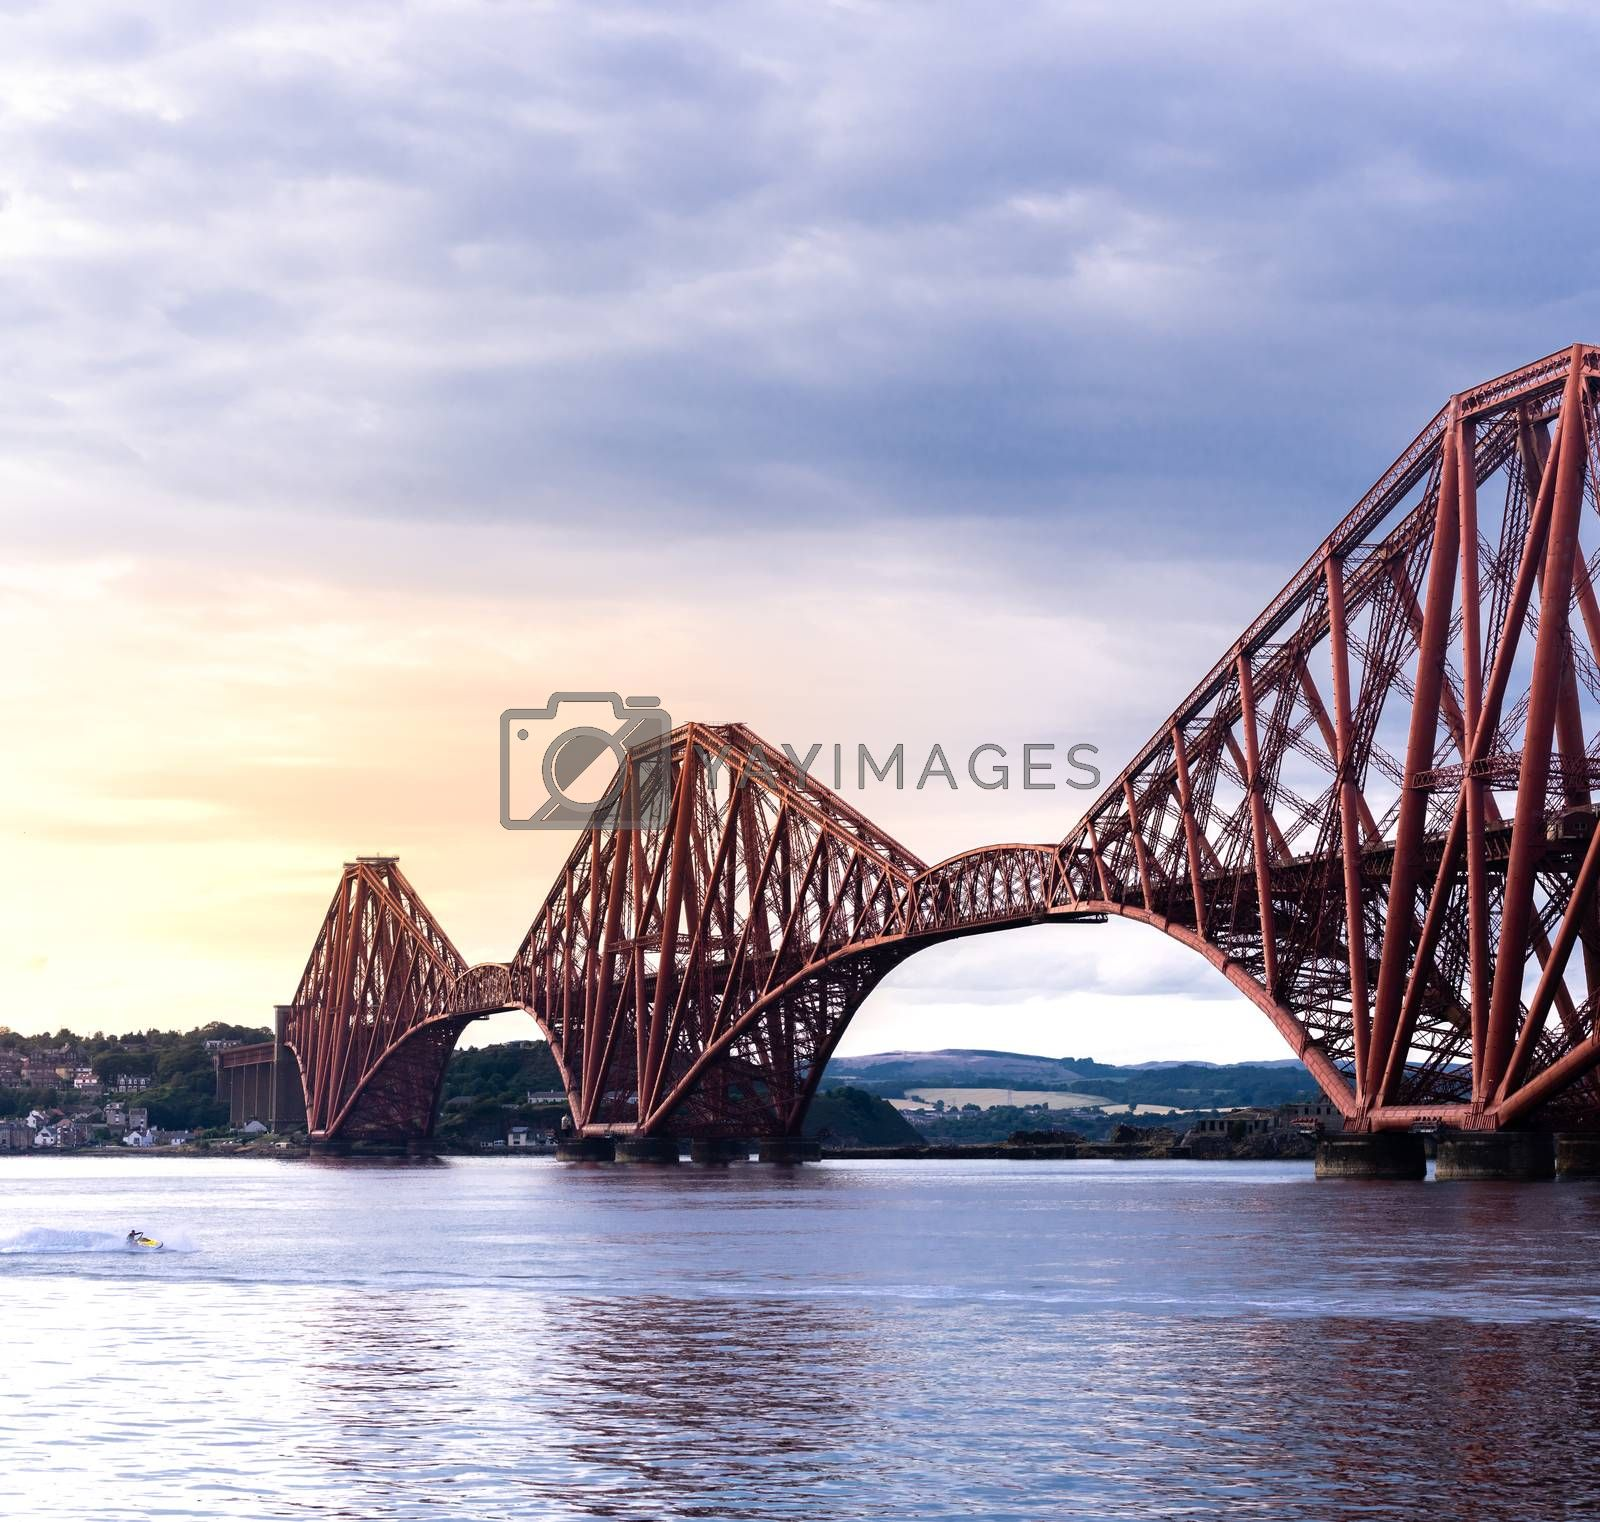 The Forth bridge, UNESCO world heritage site railway bridge in Edinburgh Scotland UK.